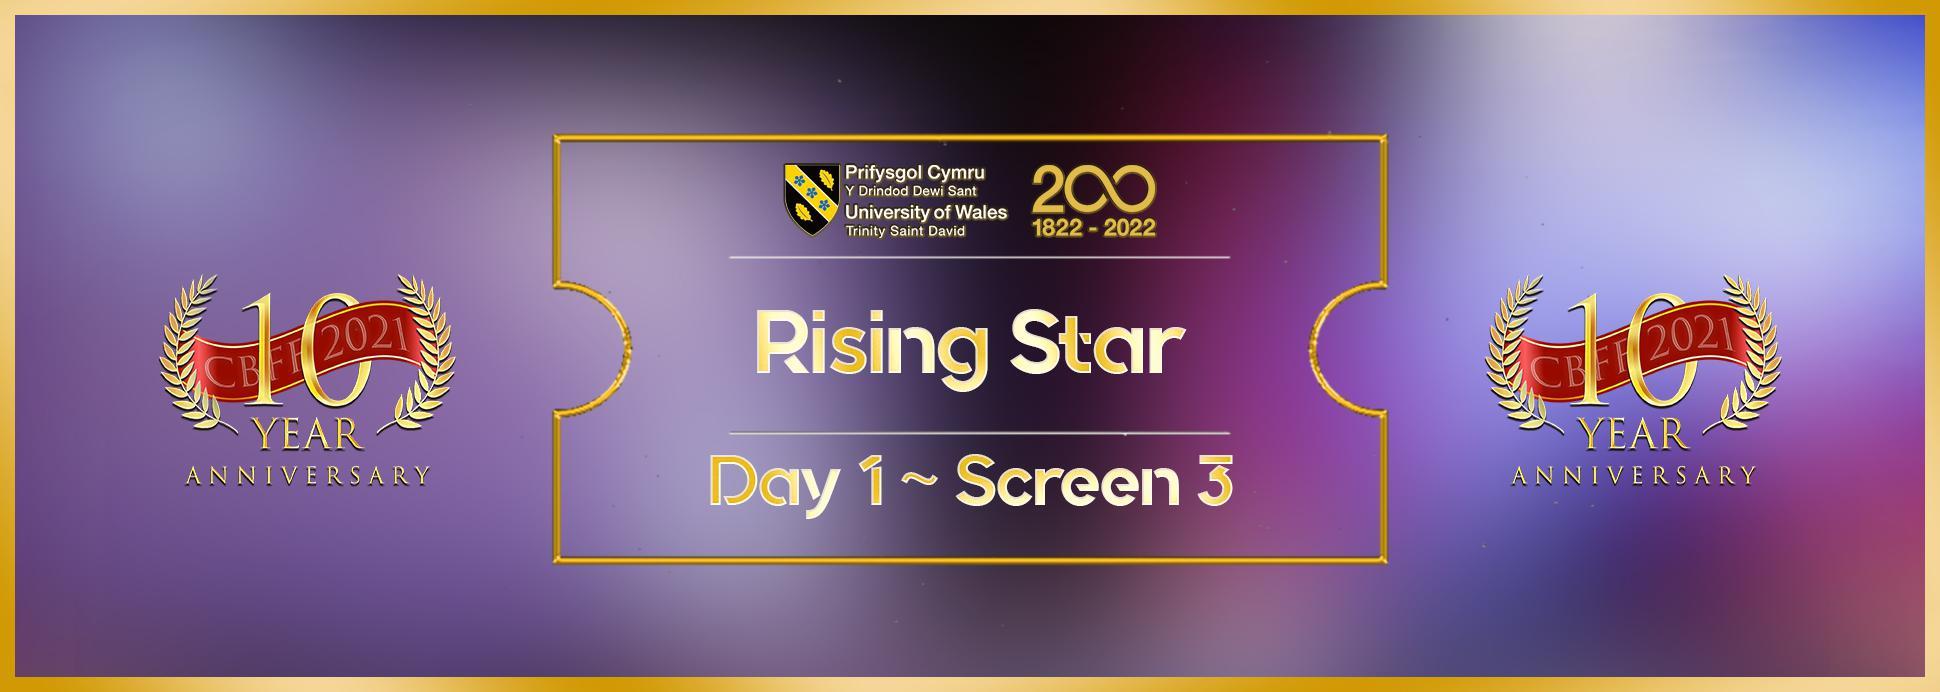 Day 1, Screen 3: Rising Star